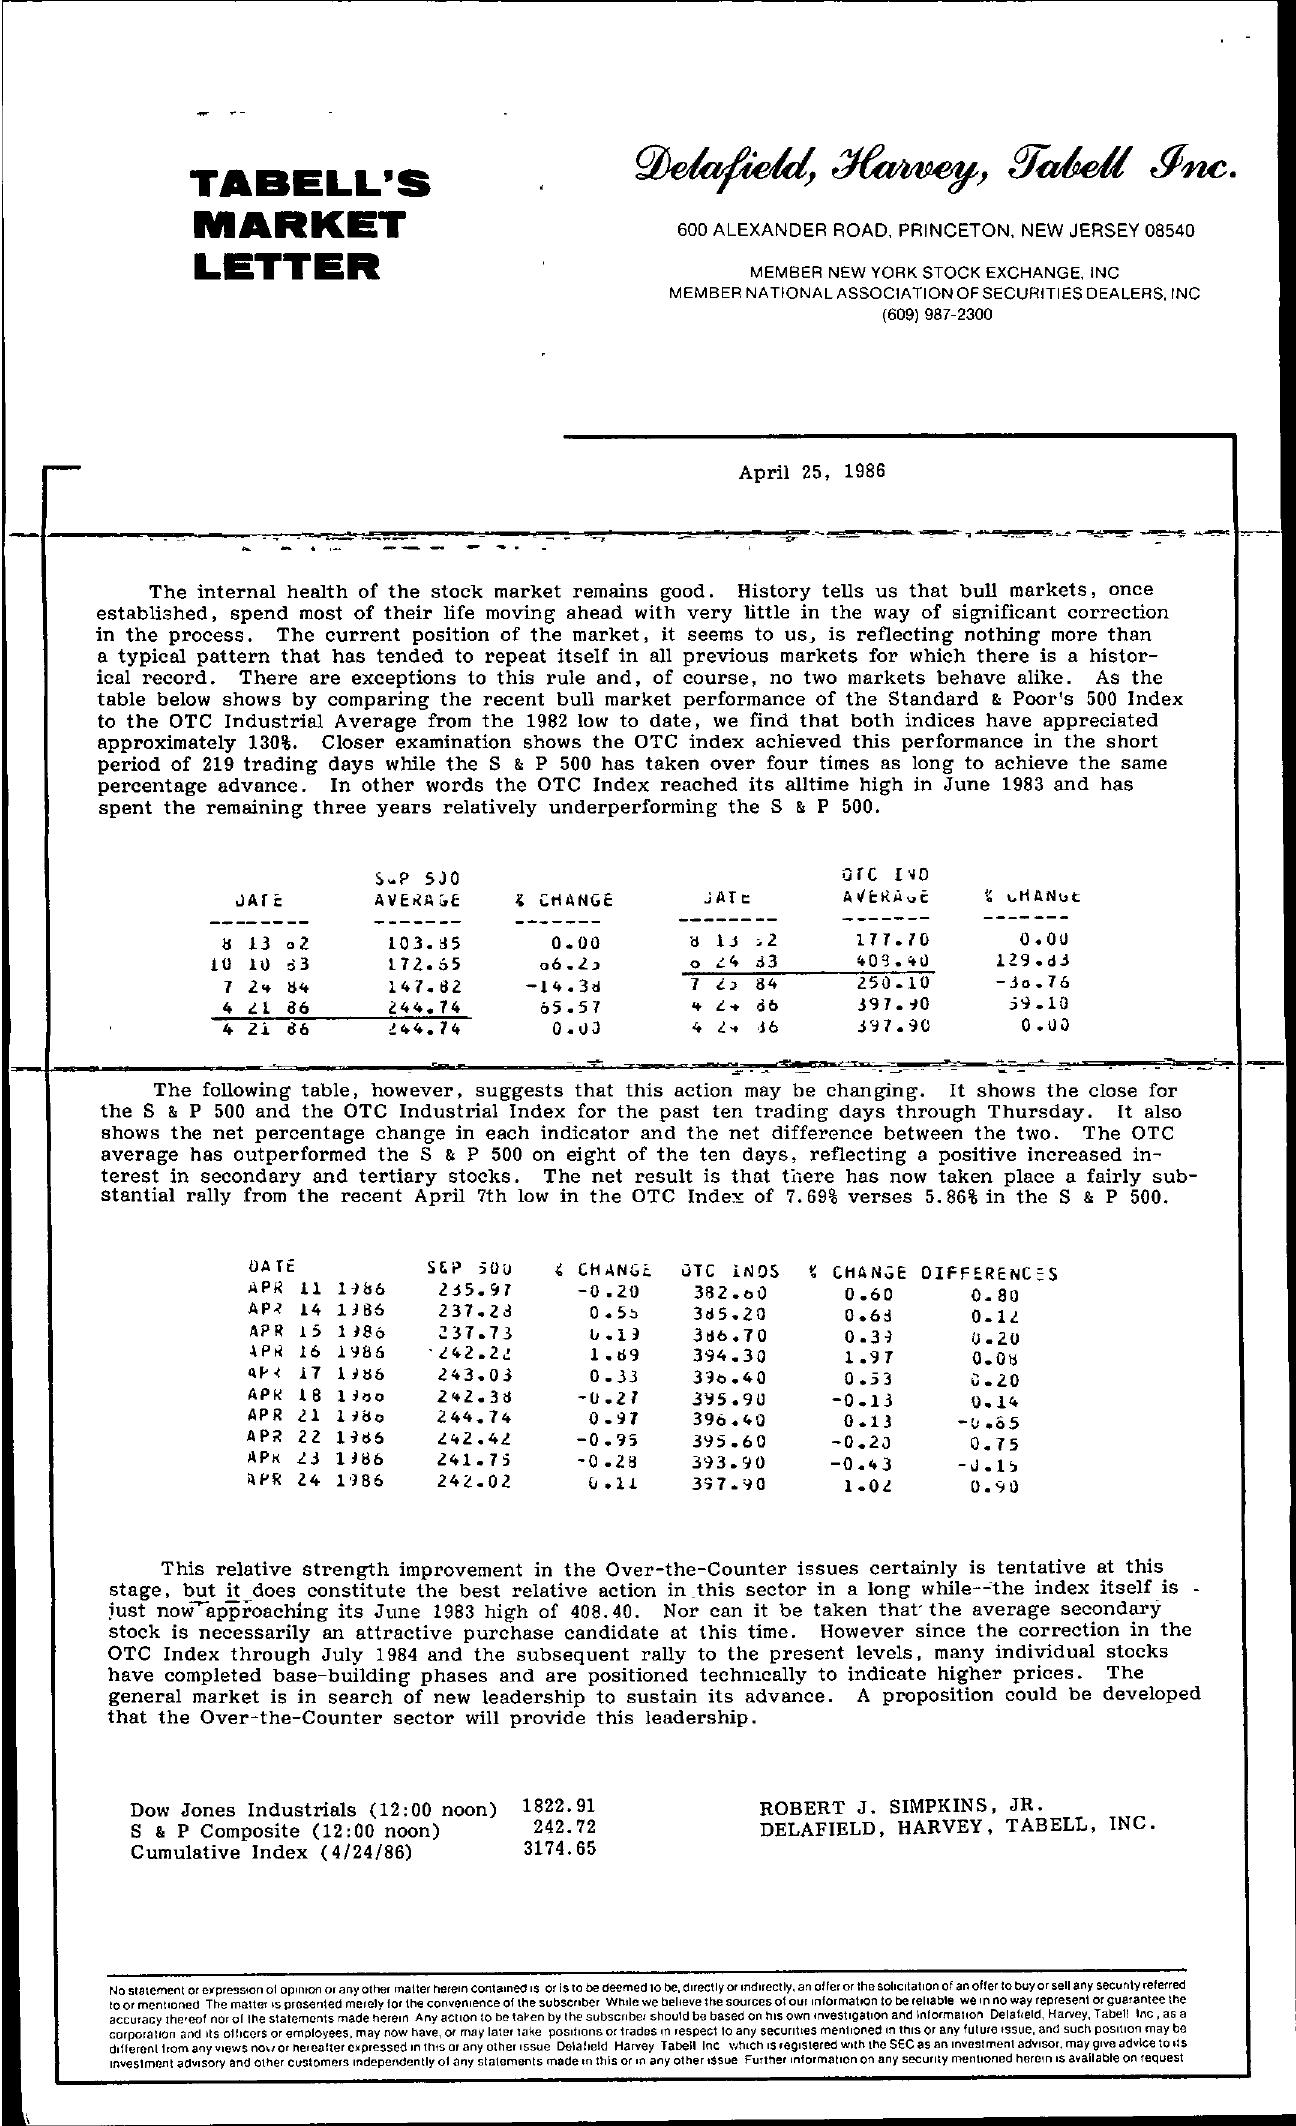 Tabell's Market Letter - April 25, 1986